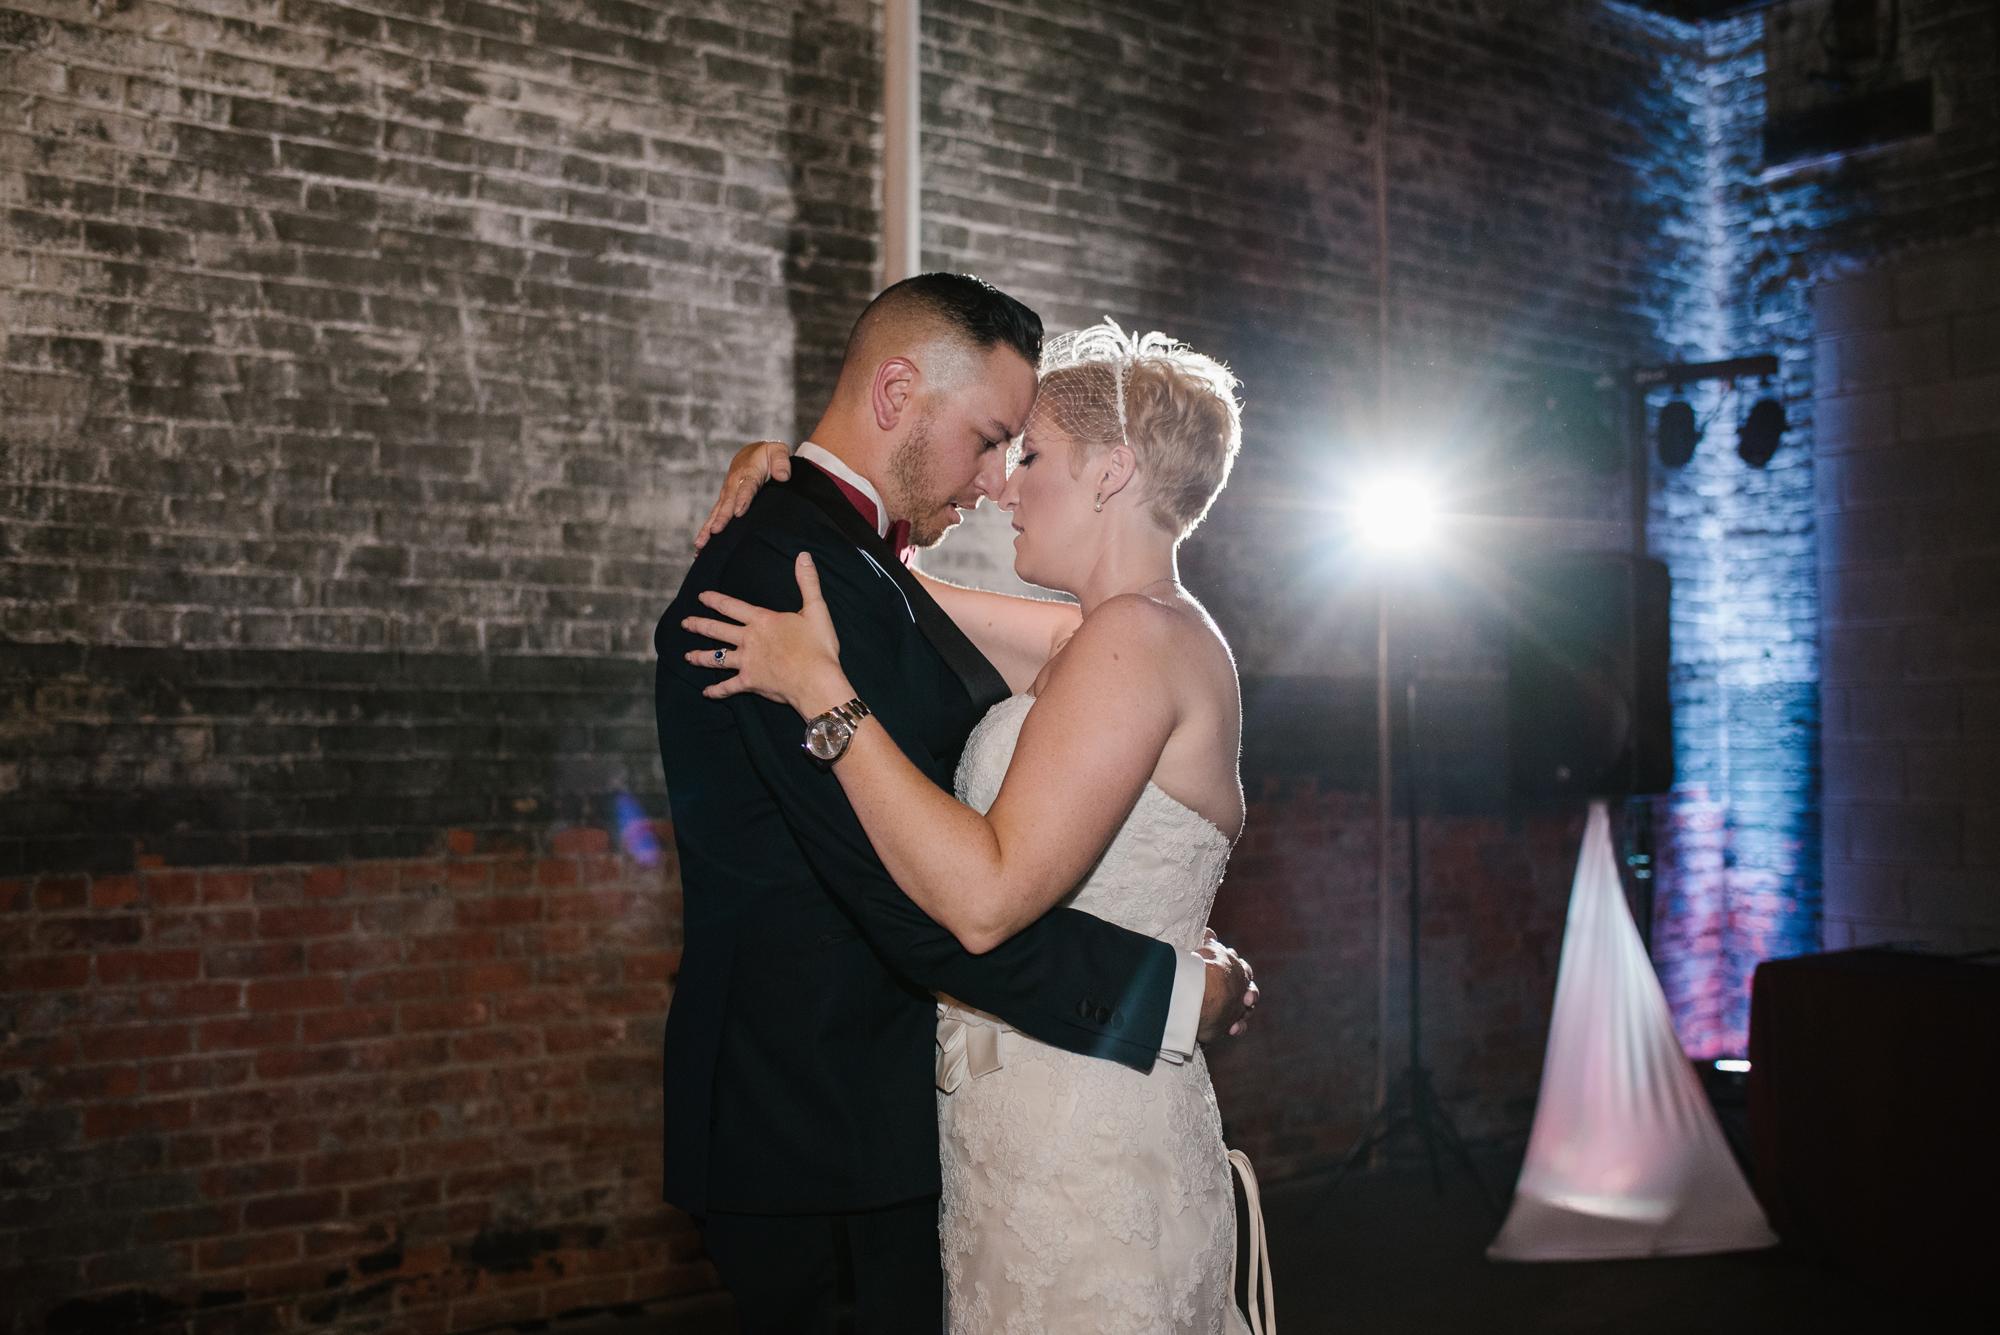 detroit-michigan-eastern-market-loft-wedding-sydney-marie (286).jpg